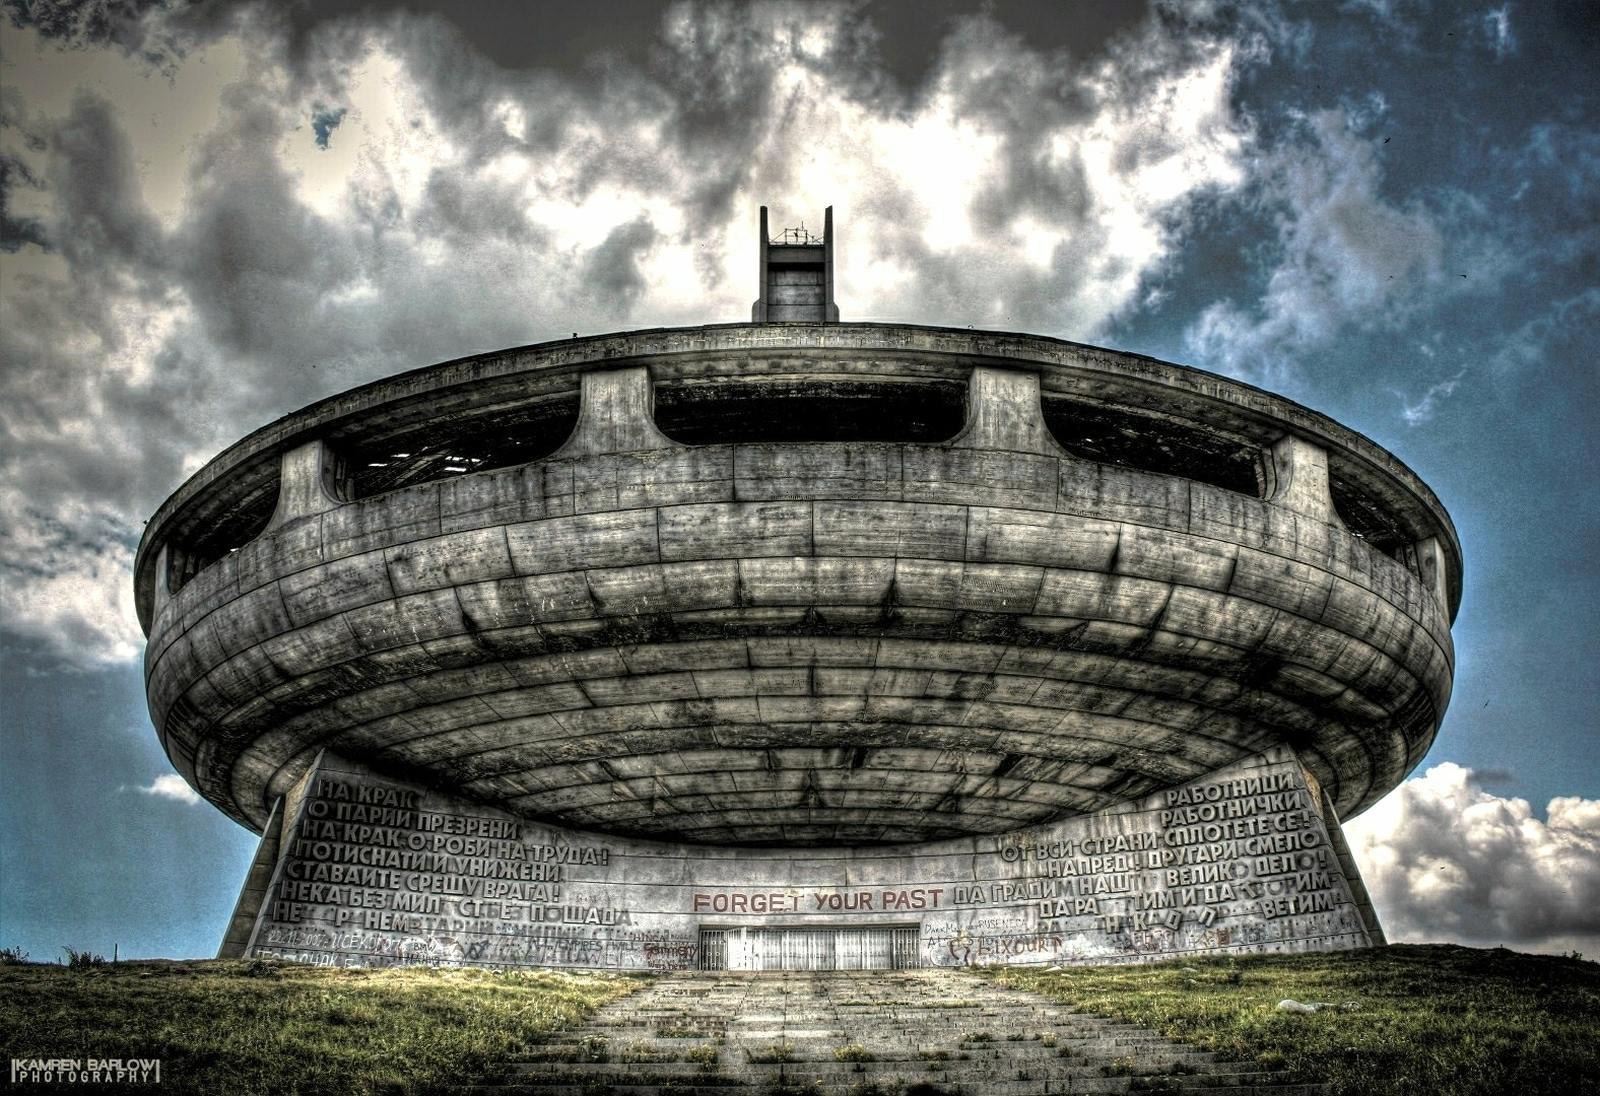 buzludzha11 Buzludzha   Forgotten Communist Monument